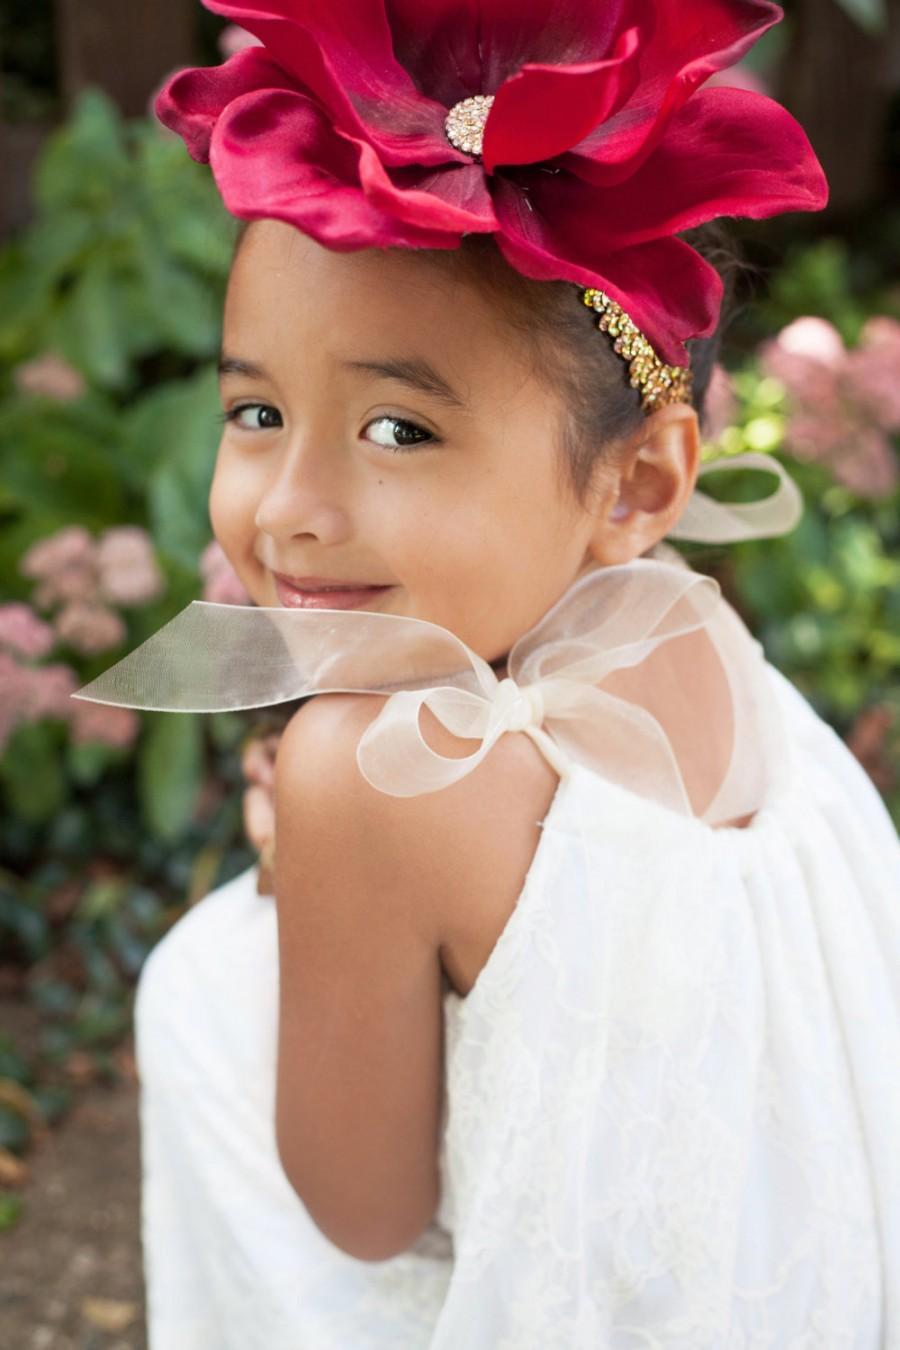 Свадьба - Flower Girl Dress, Ivory Lace Dress, White Lace Dress, Boho Flower Girl Dress, Communion Dress, Rustic Dress, Baptism Dress, Toddler Dress